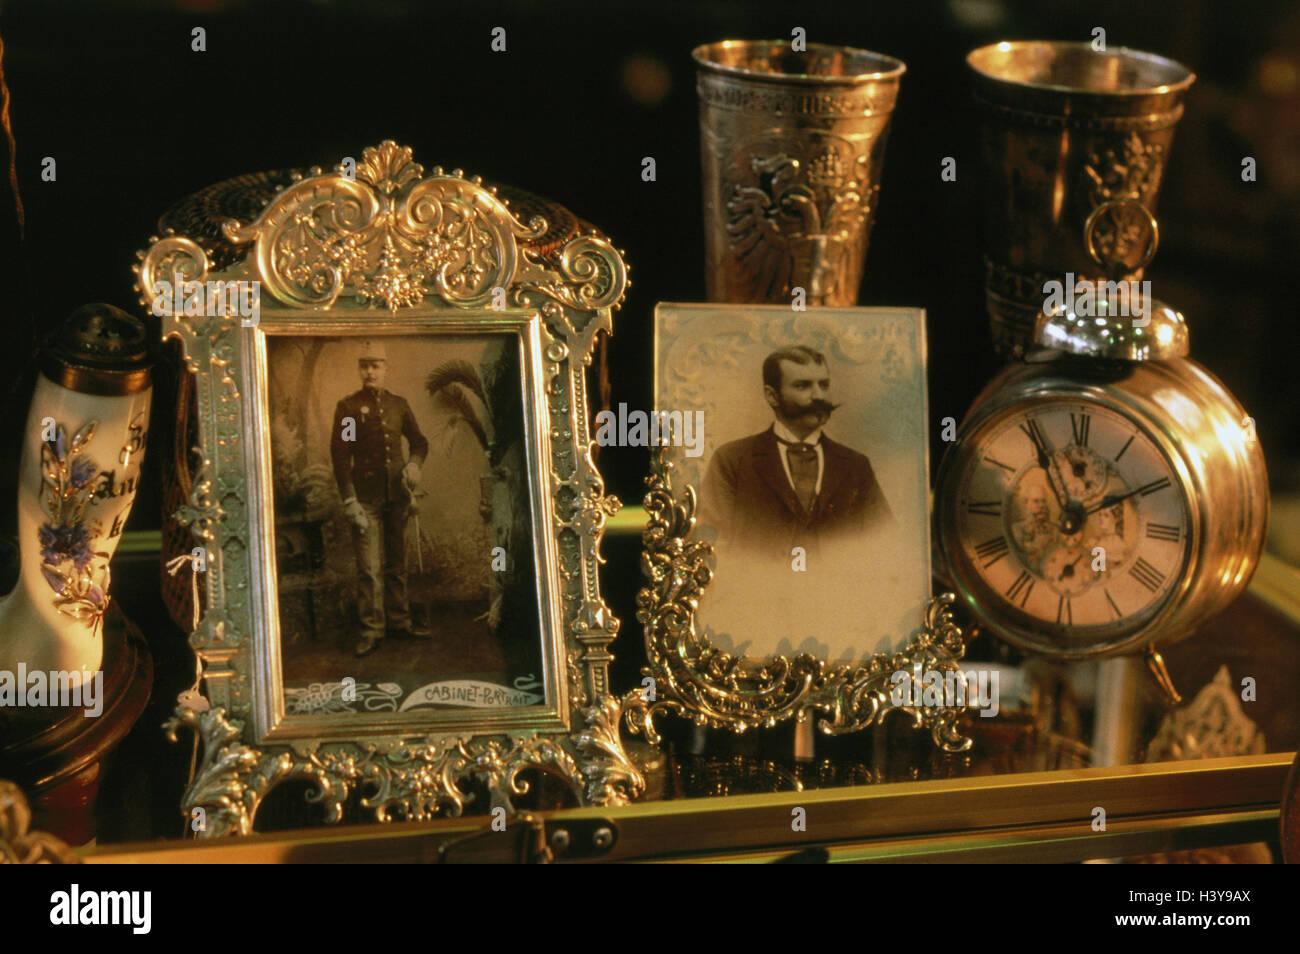 Flohmarkt, Bilder, Bilderrahmen, Uhr, Becher, Silber, 19. Jh ...